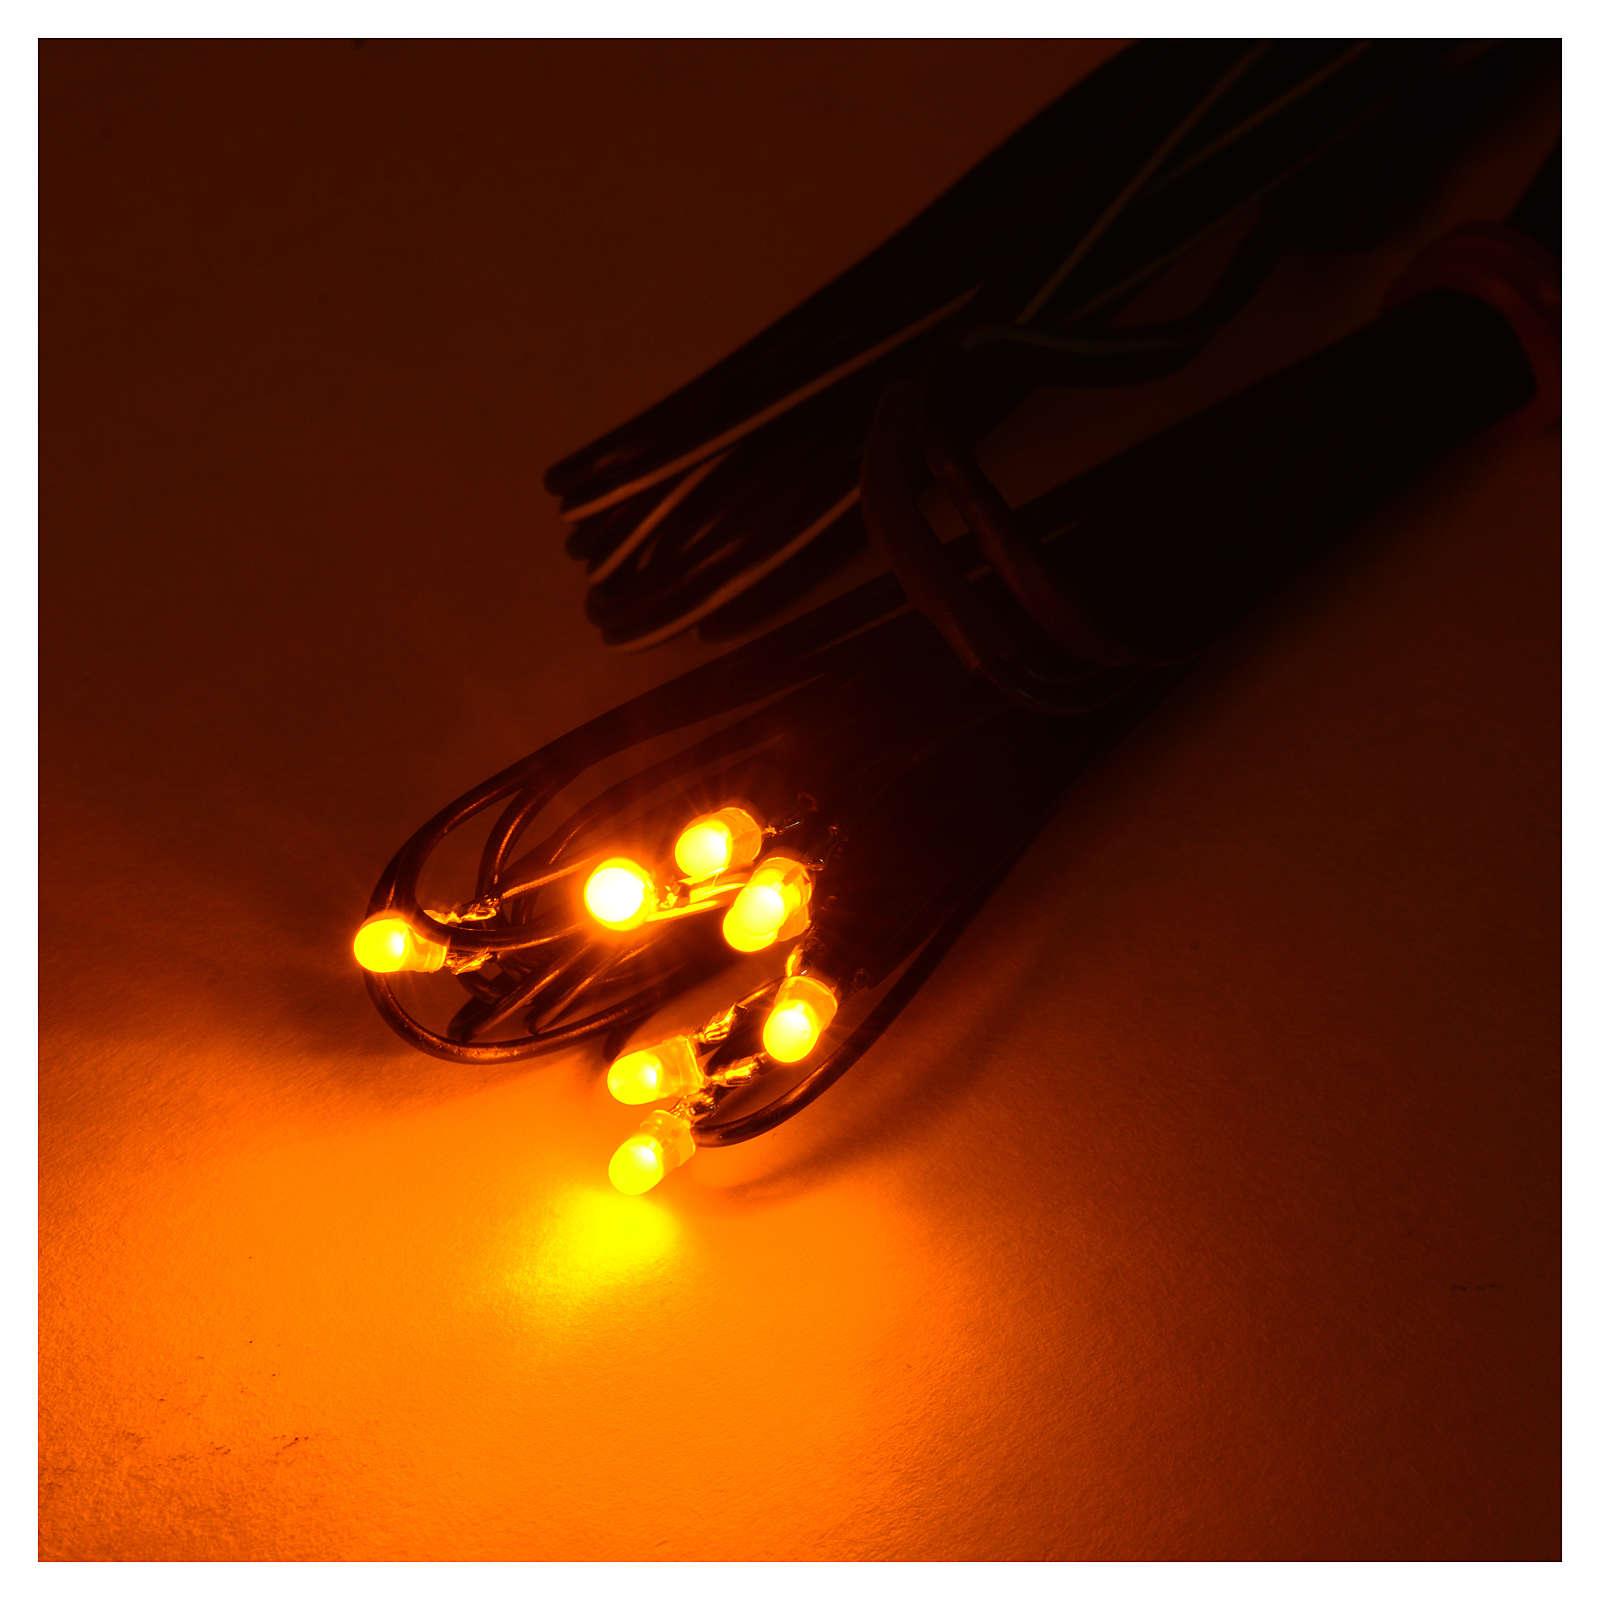 Led per luci case per centraline serie Frisalight 4